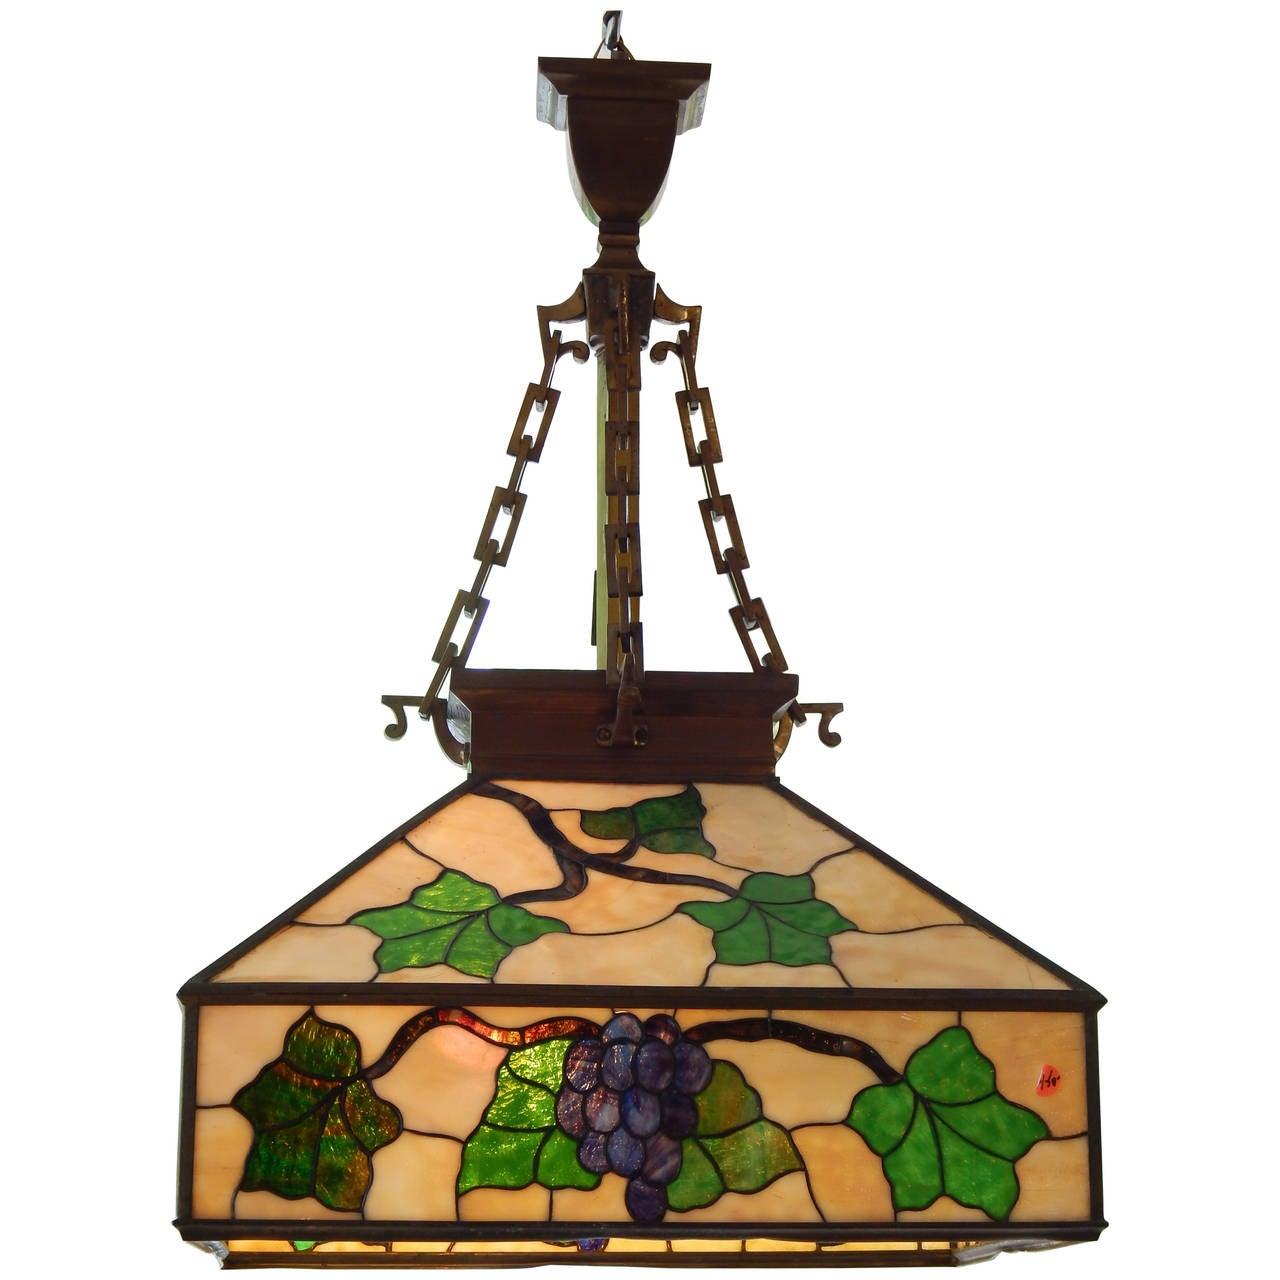 Arts & Crafts Style Leaded Glass Lantern Chandelier 1